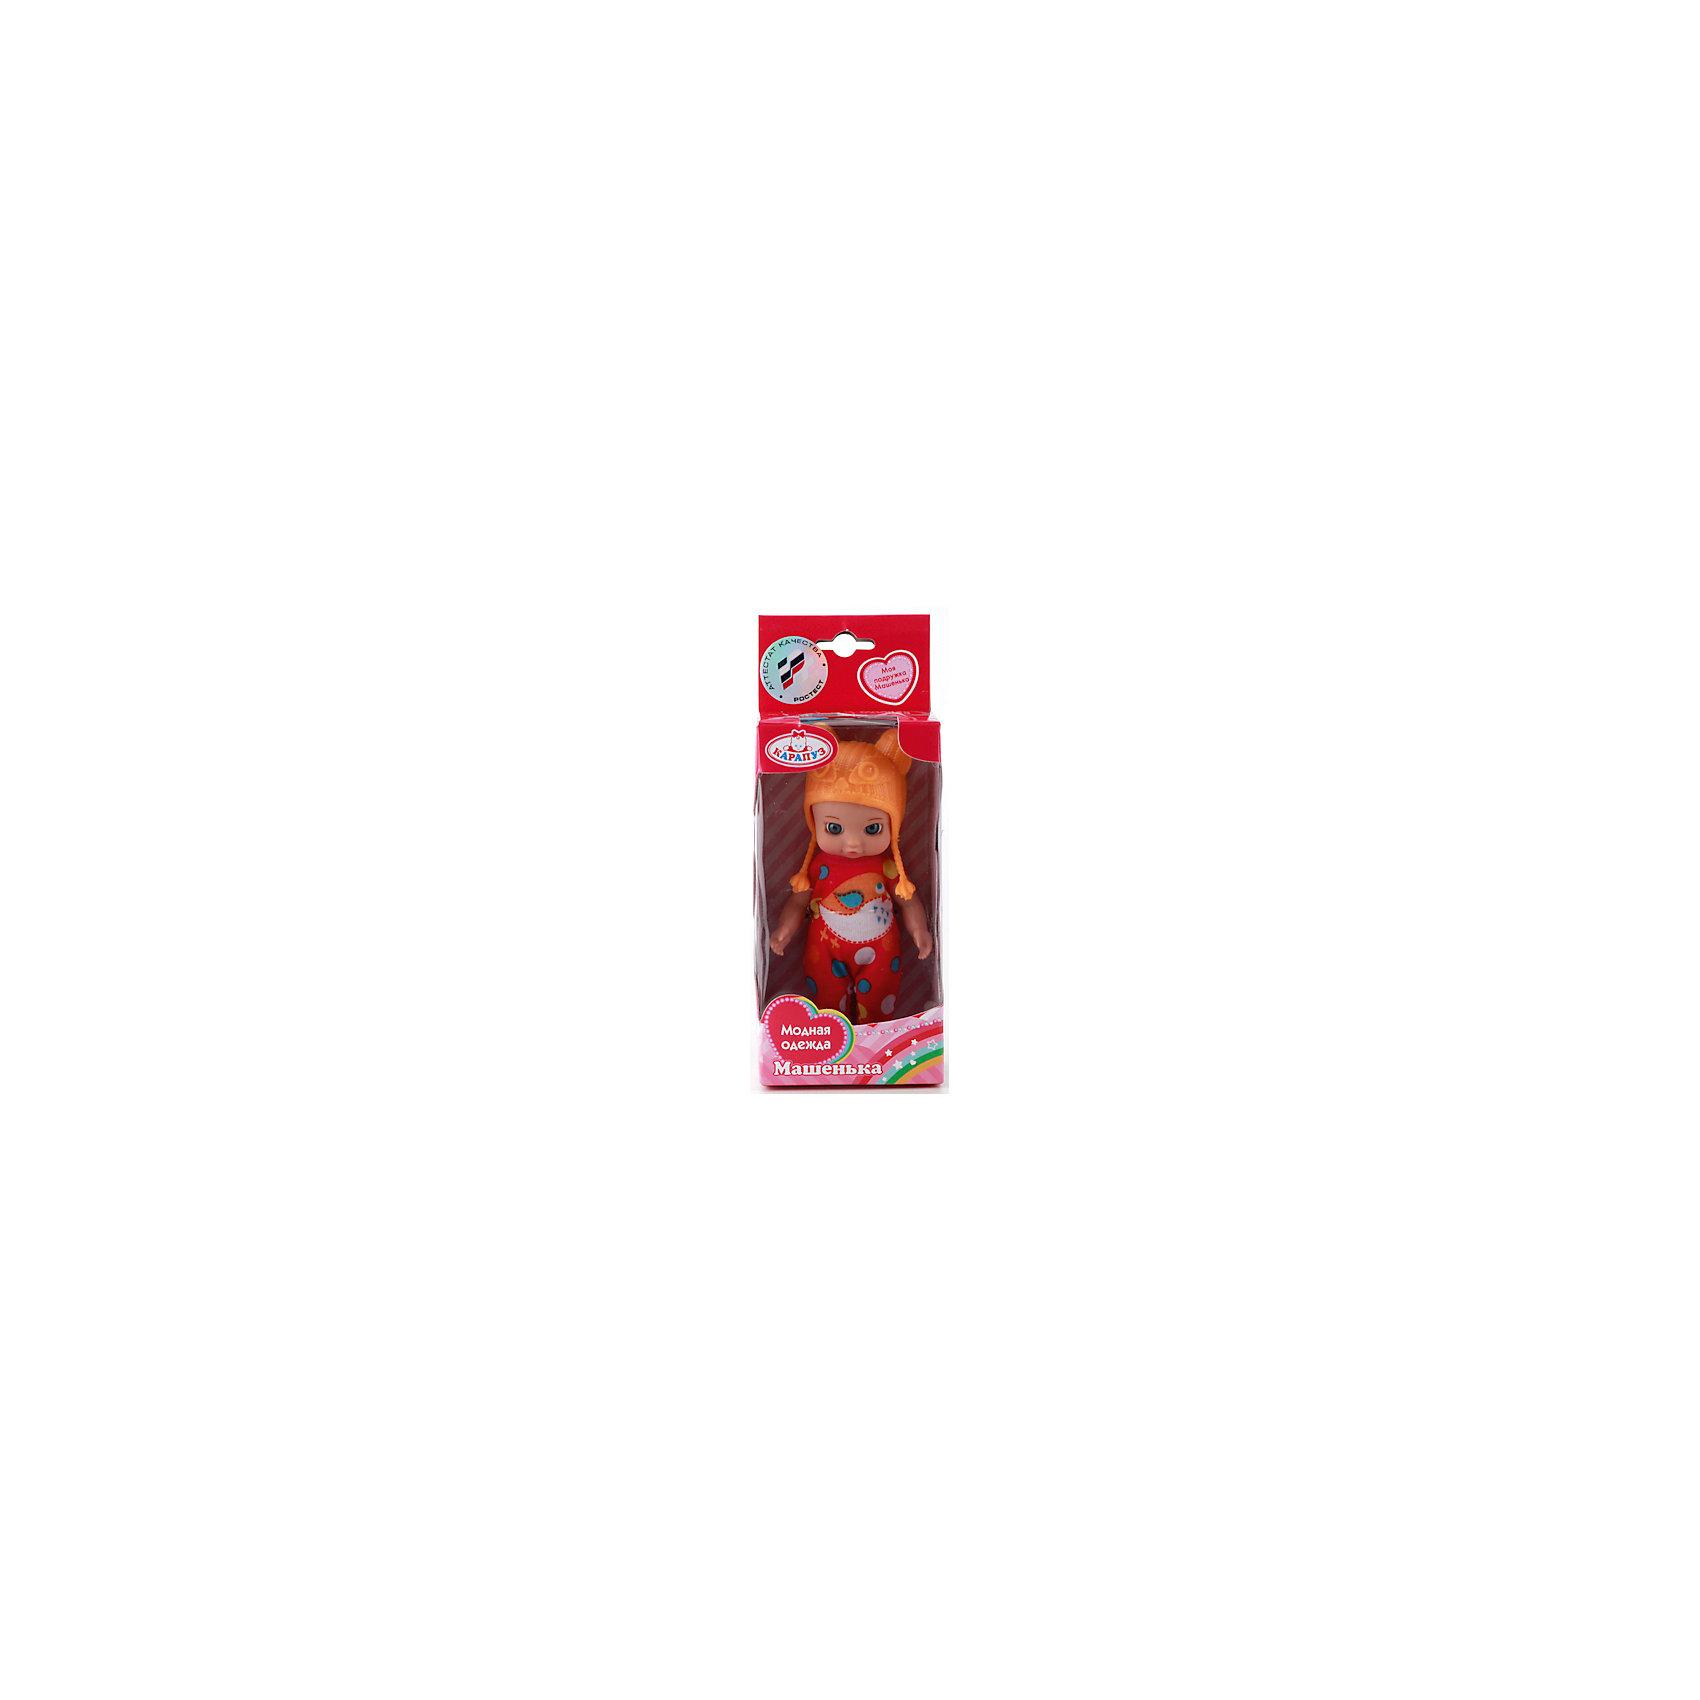 Карапуз Кукла без звука, 12 см, Карапуз куклы карапуз кукла карапуз принцесса рапунцель 25 см